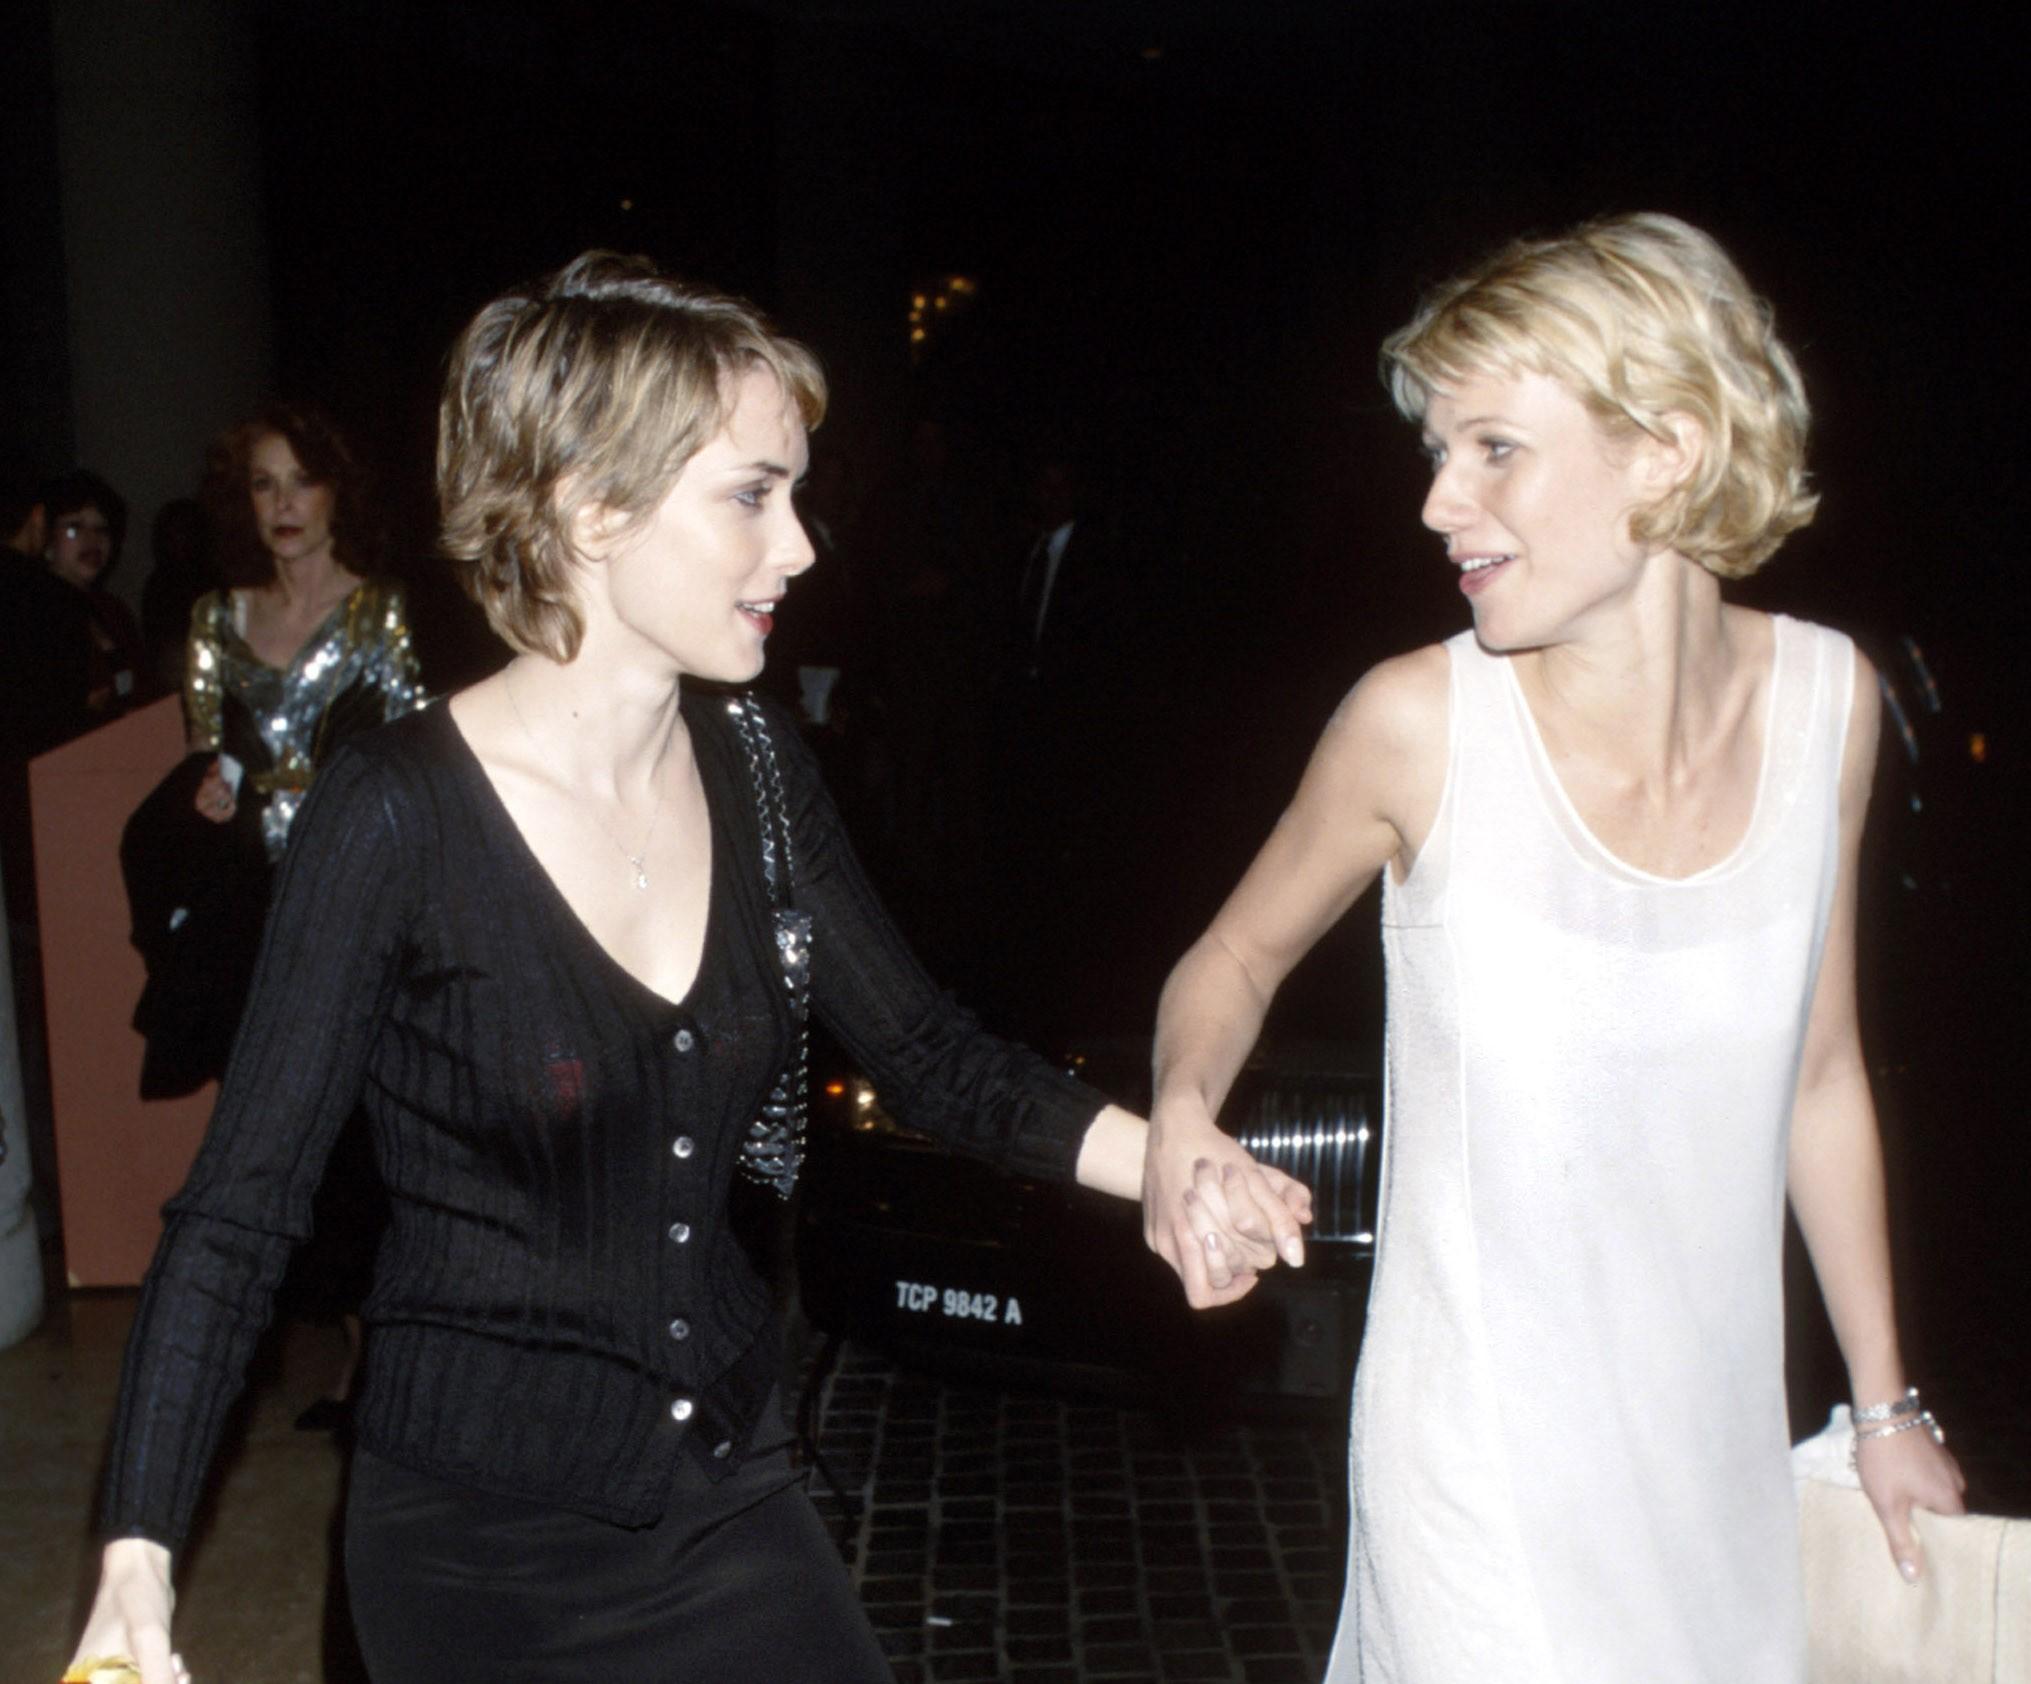 Winona Ryder and Gwyneth Paltrow